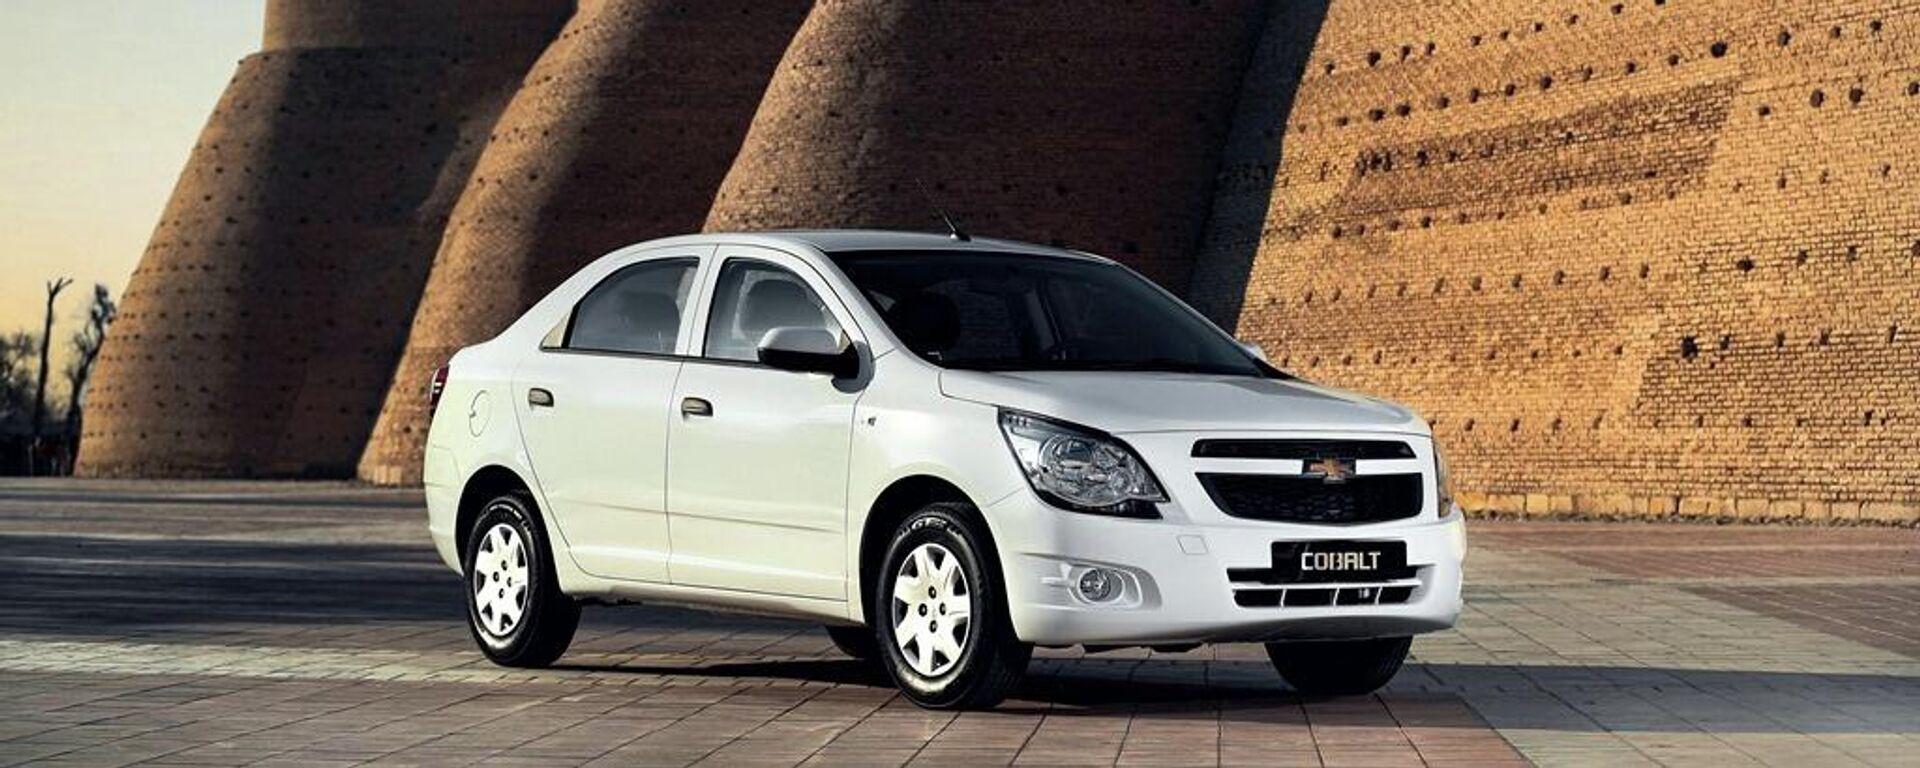 АО UzAuto Motors объявляет о старте продаж четырех моделей бренда Chevrolet –Spark, Cobalt, Nexia и Lacetti в Таджикистане  - Sputnik Узбекистан, 1920, 05.09.2021